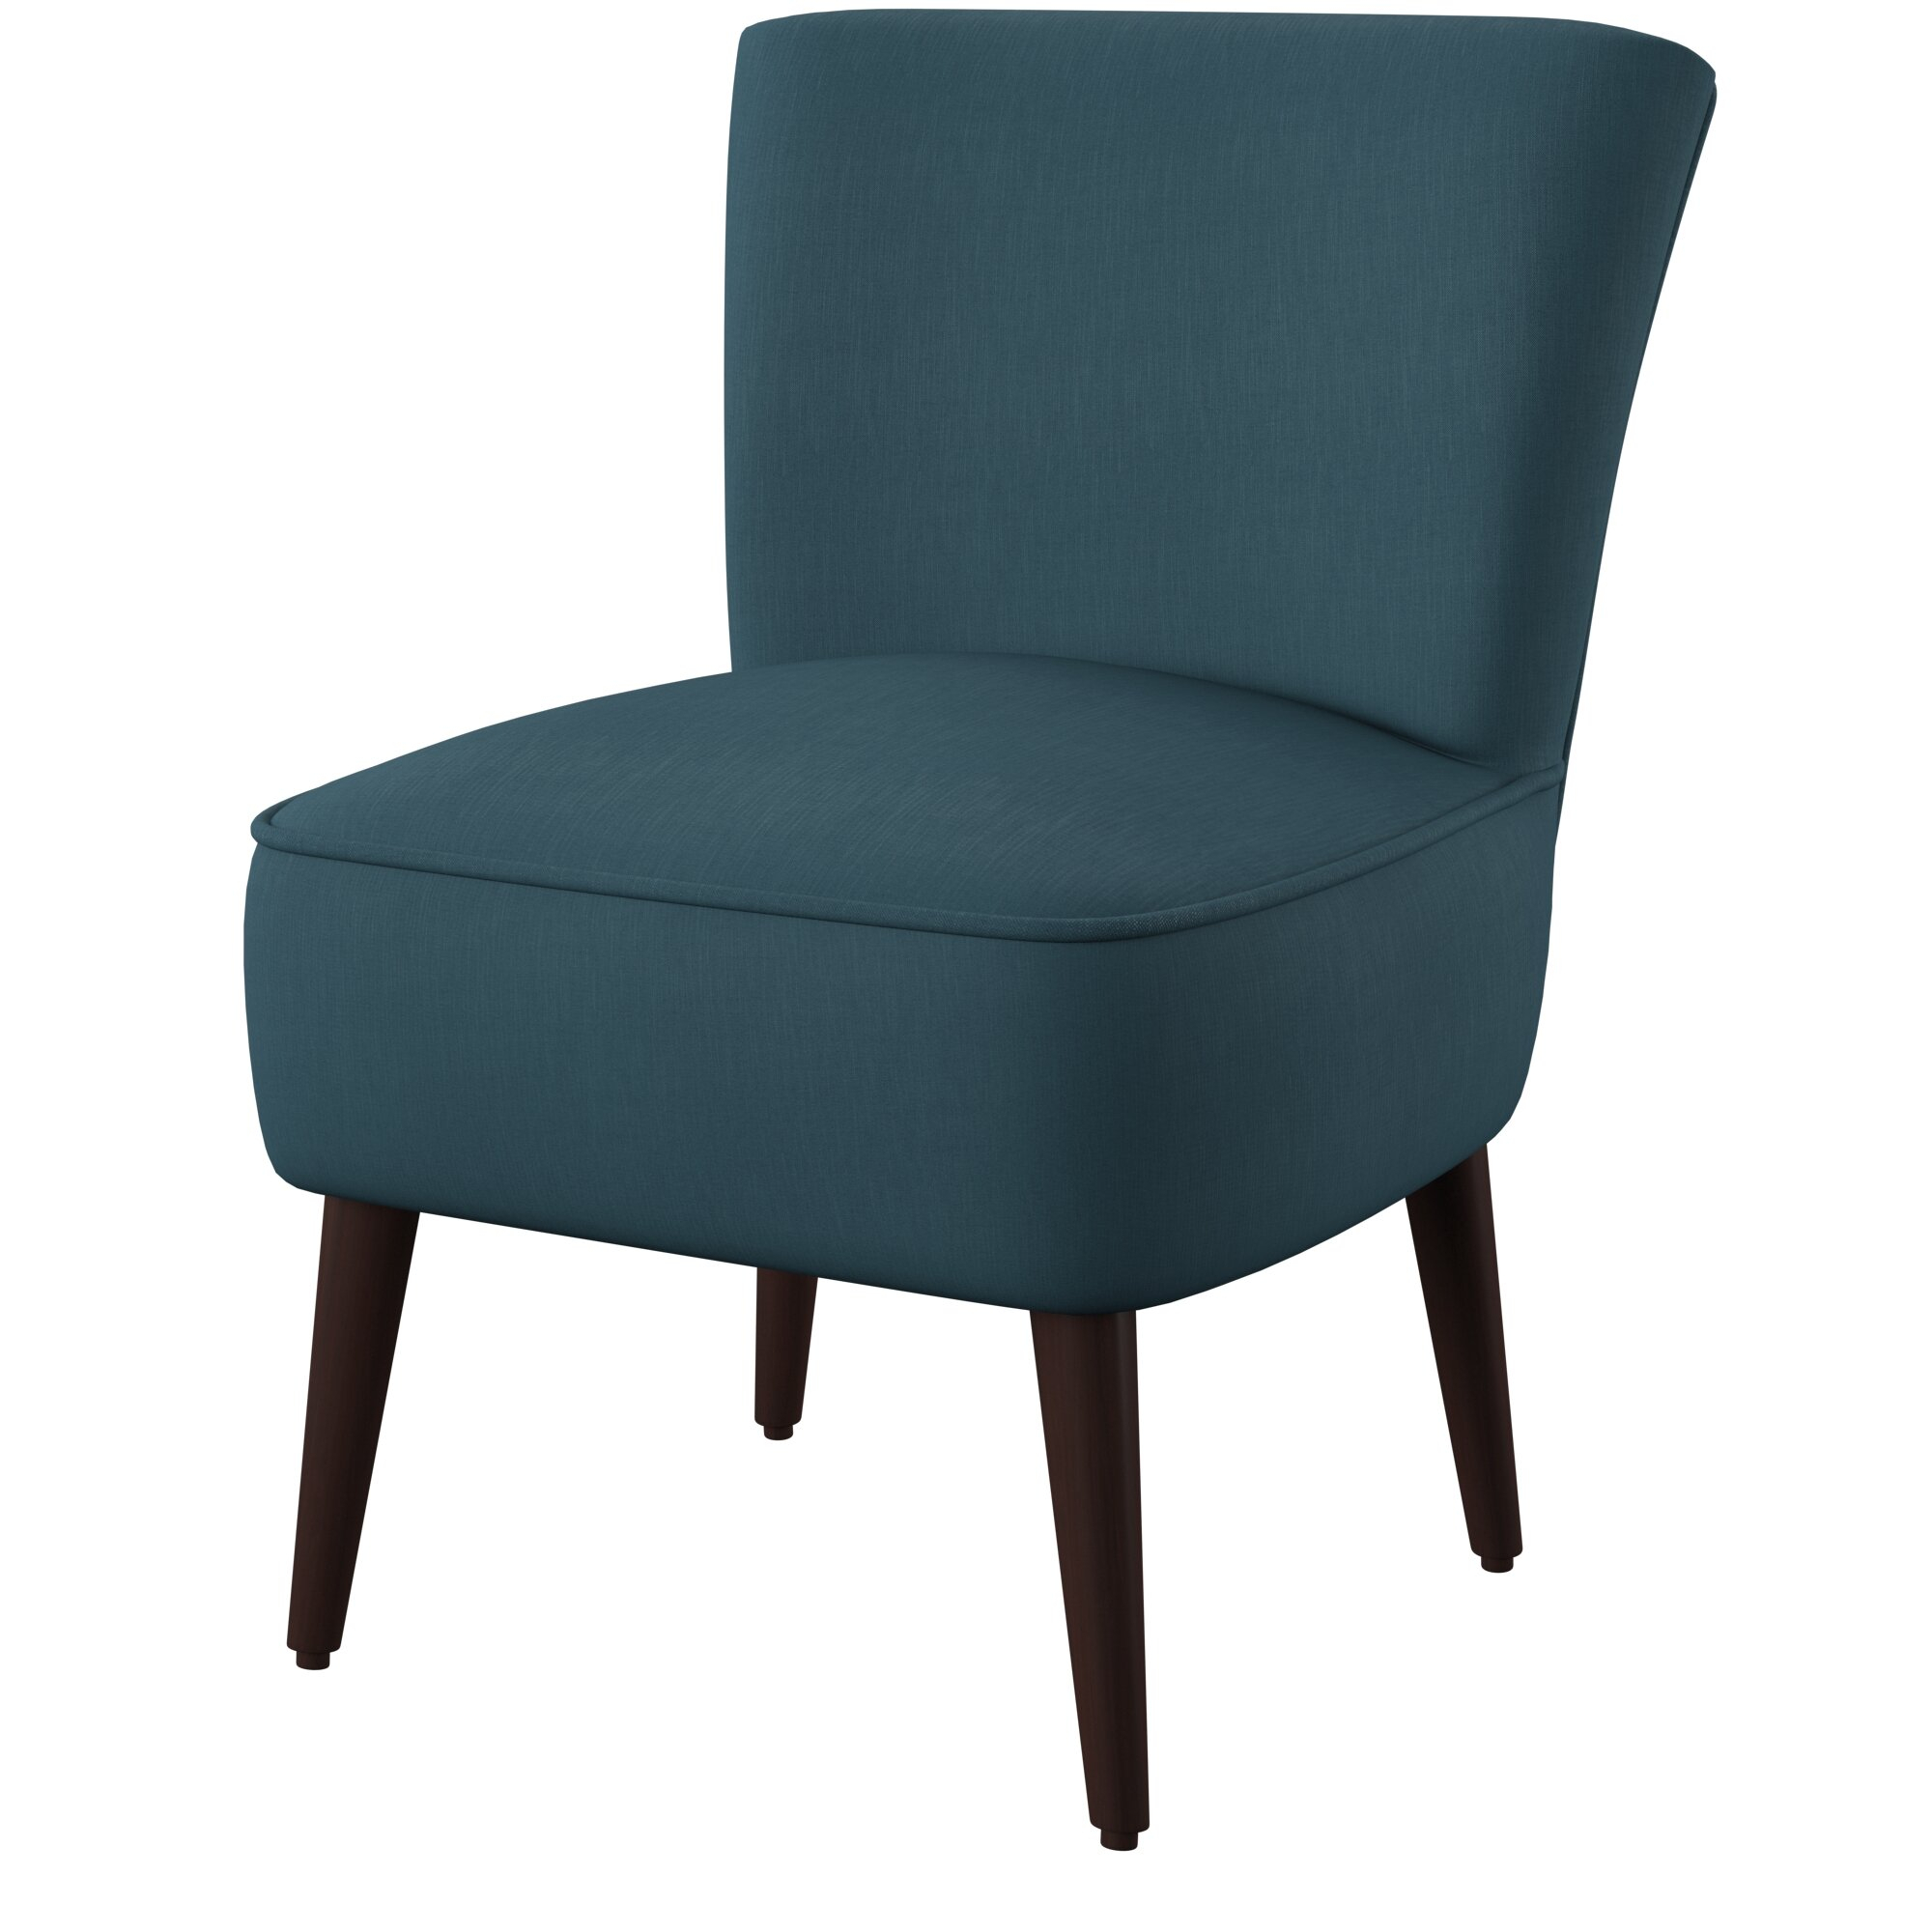 Cureton Slipper Chair In Wadhurst Slipper Chairs (View 13 of 15)